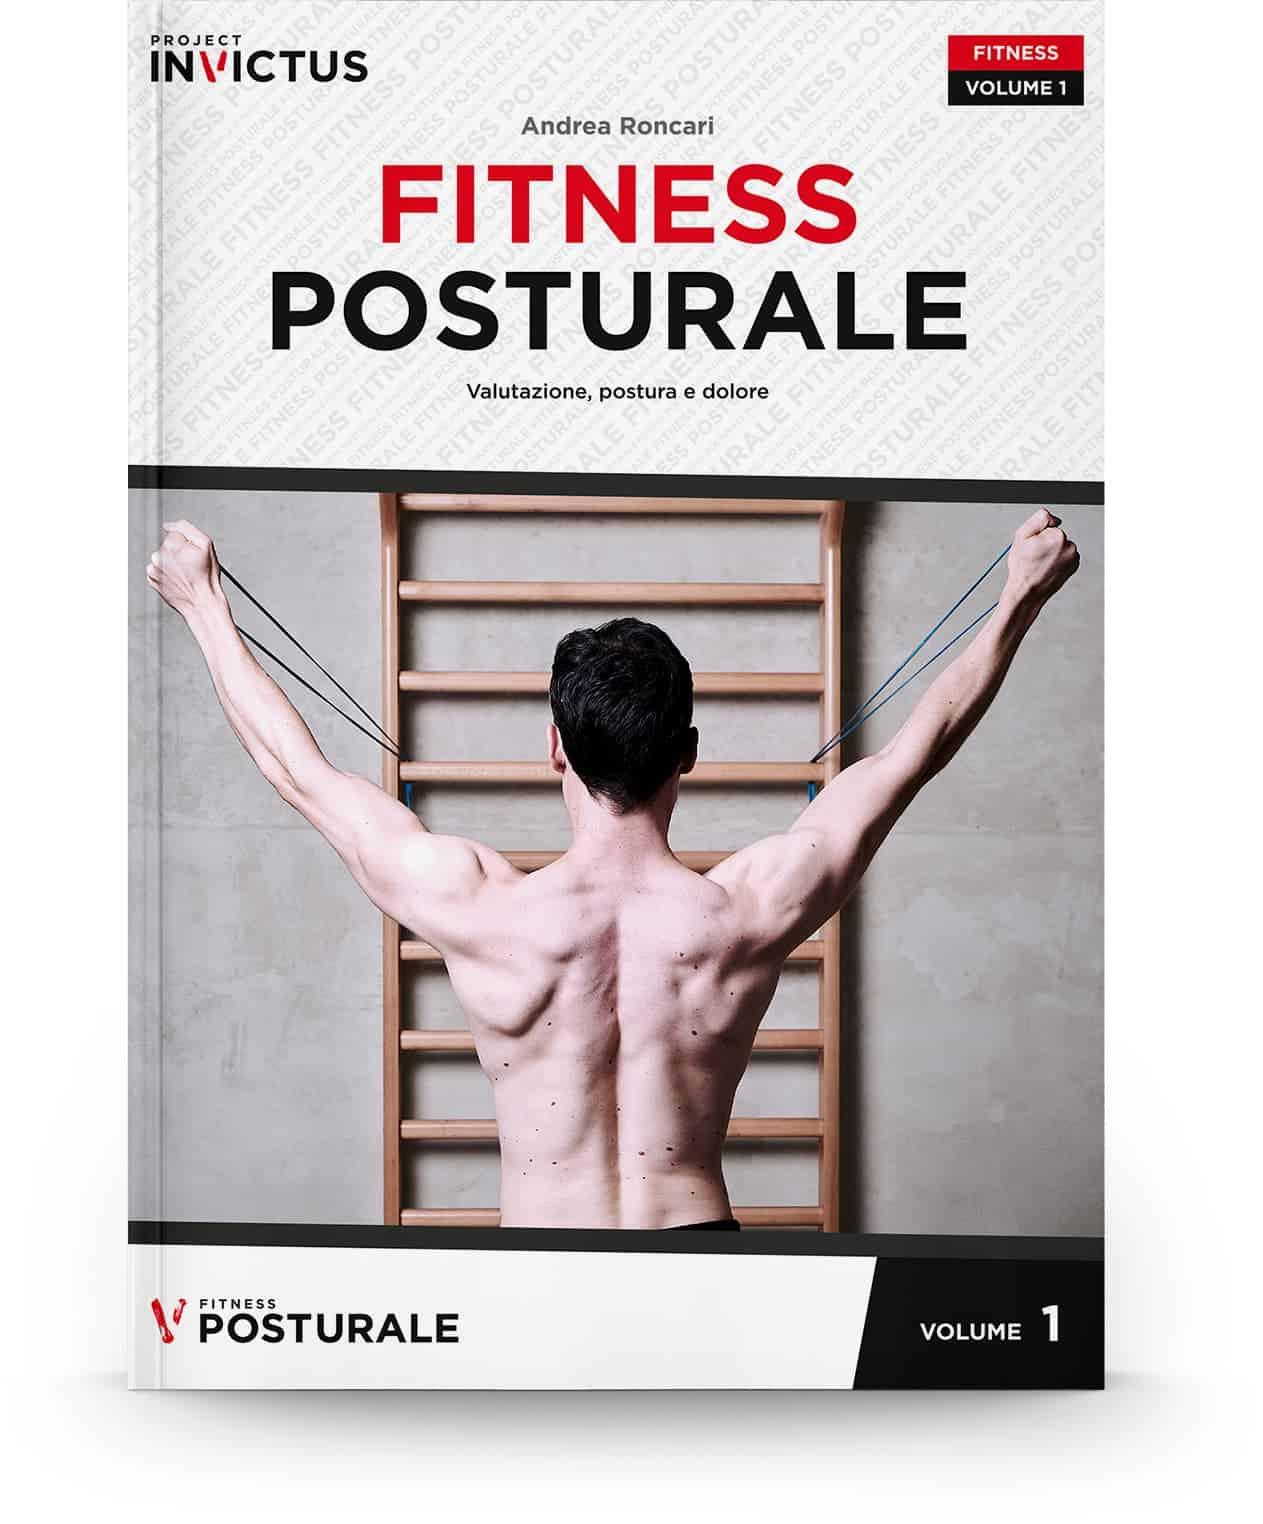 Fitness Posturale Volume 1